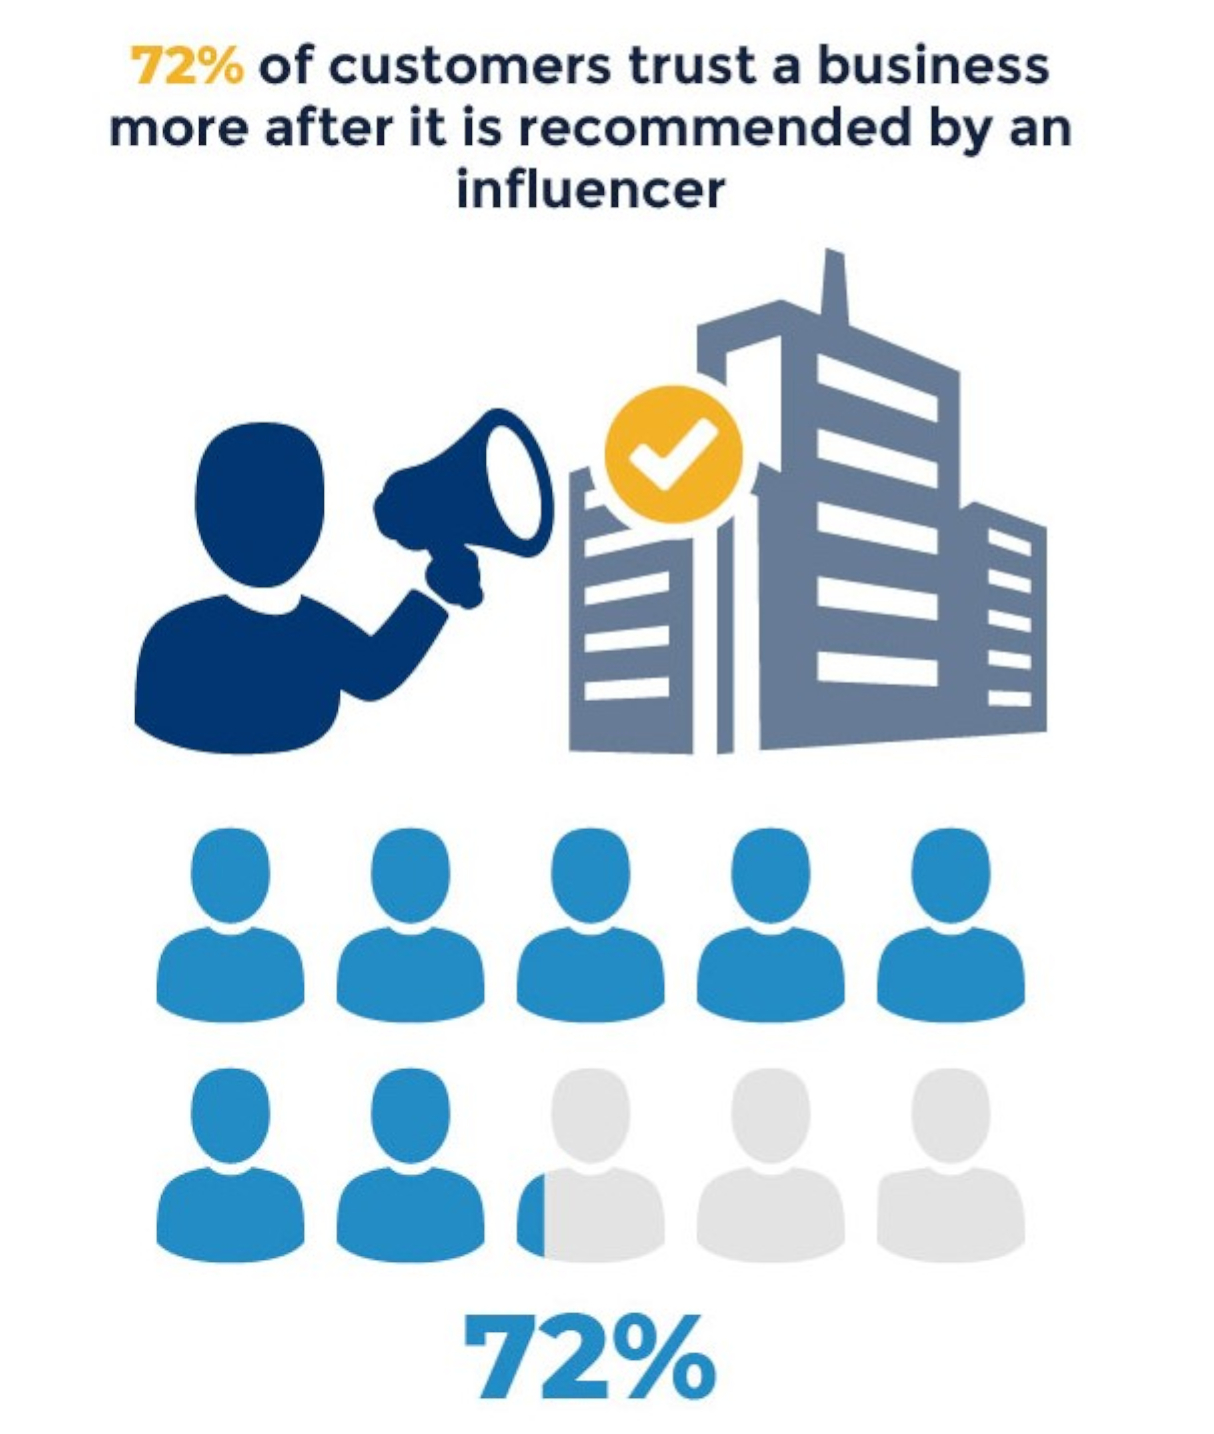 Social media influencers establish trust and respect for brands.